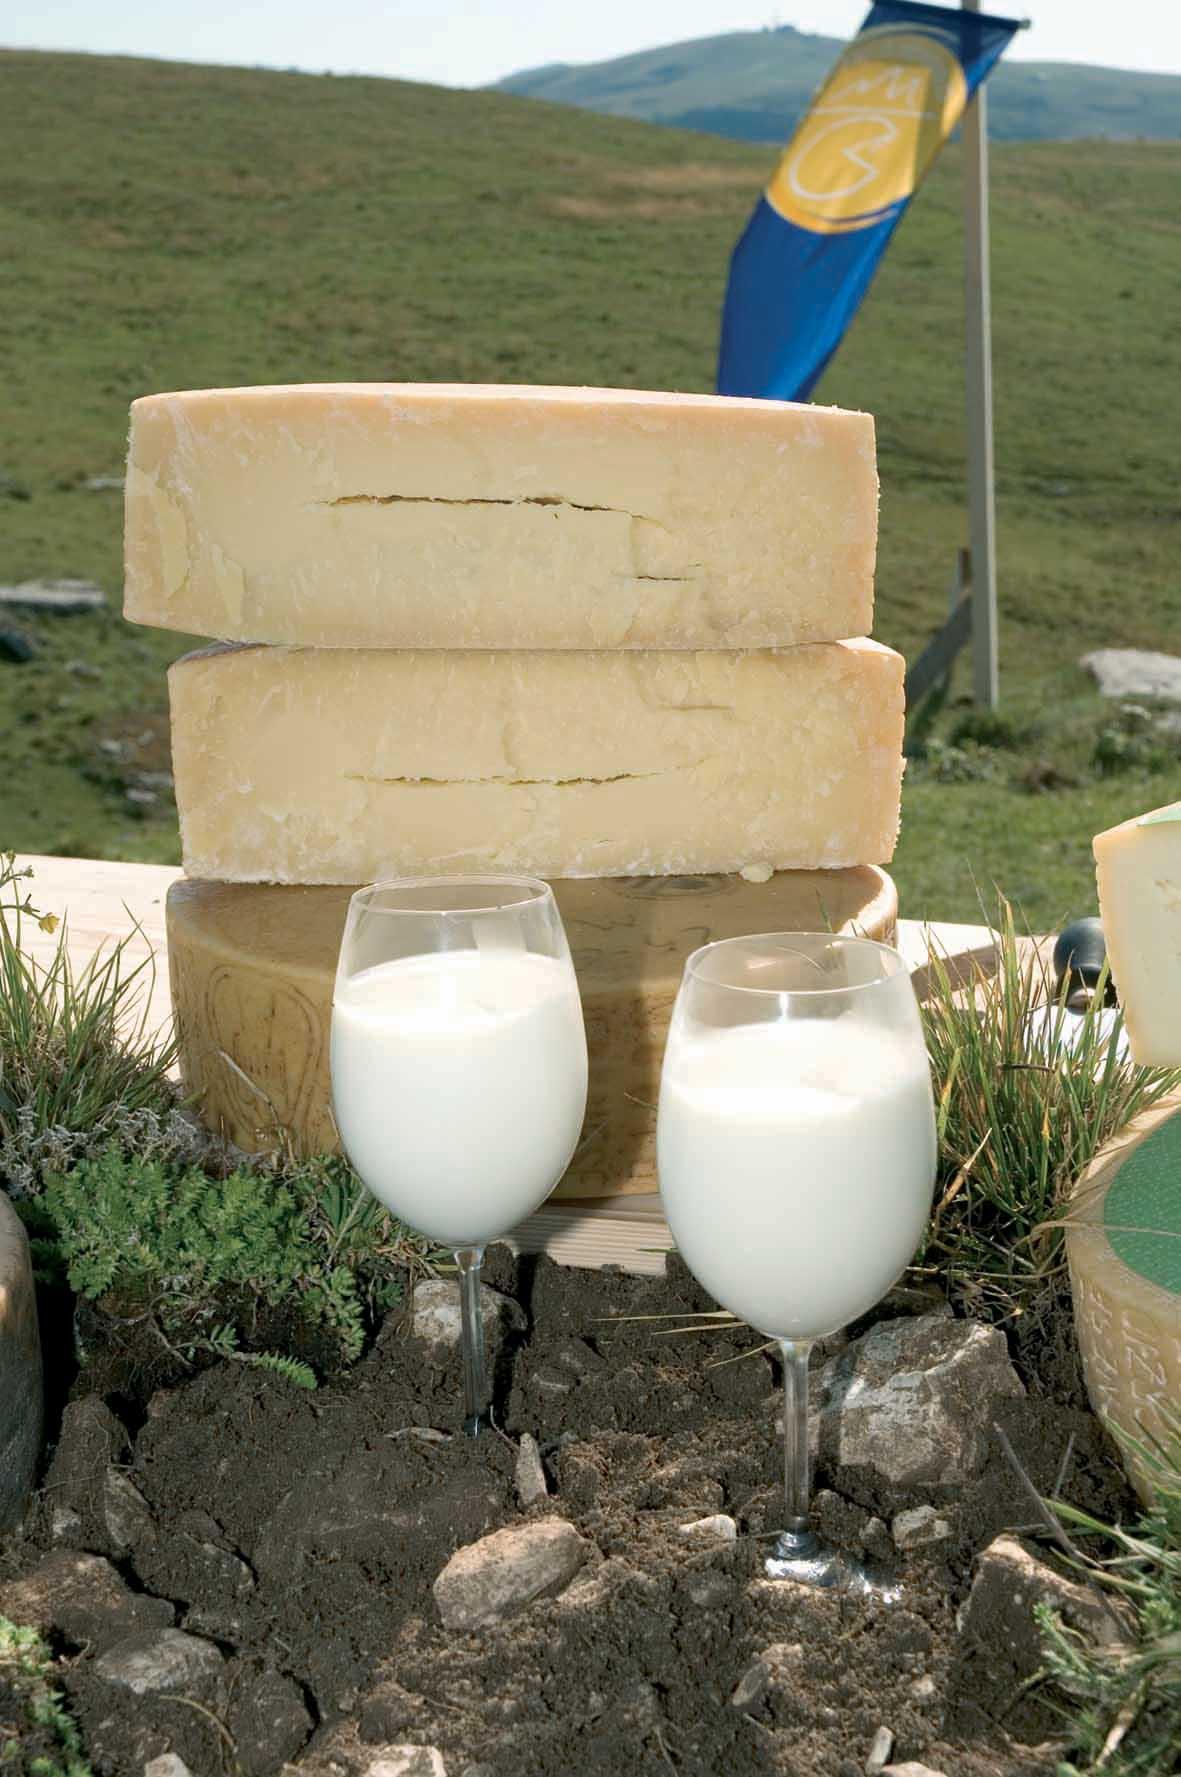 Olimpiadi formaggio bicchieri latte forme formaggio terra